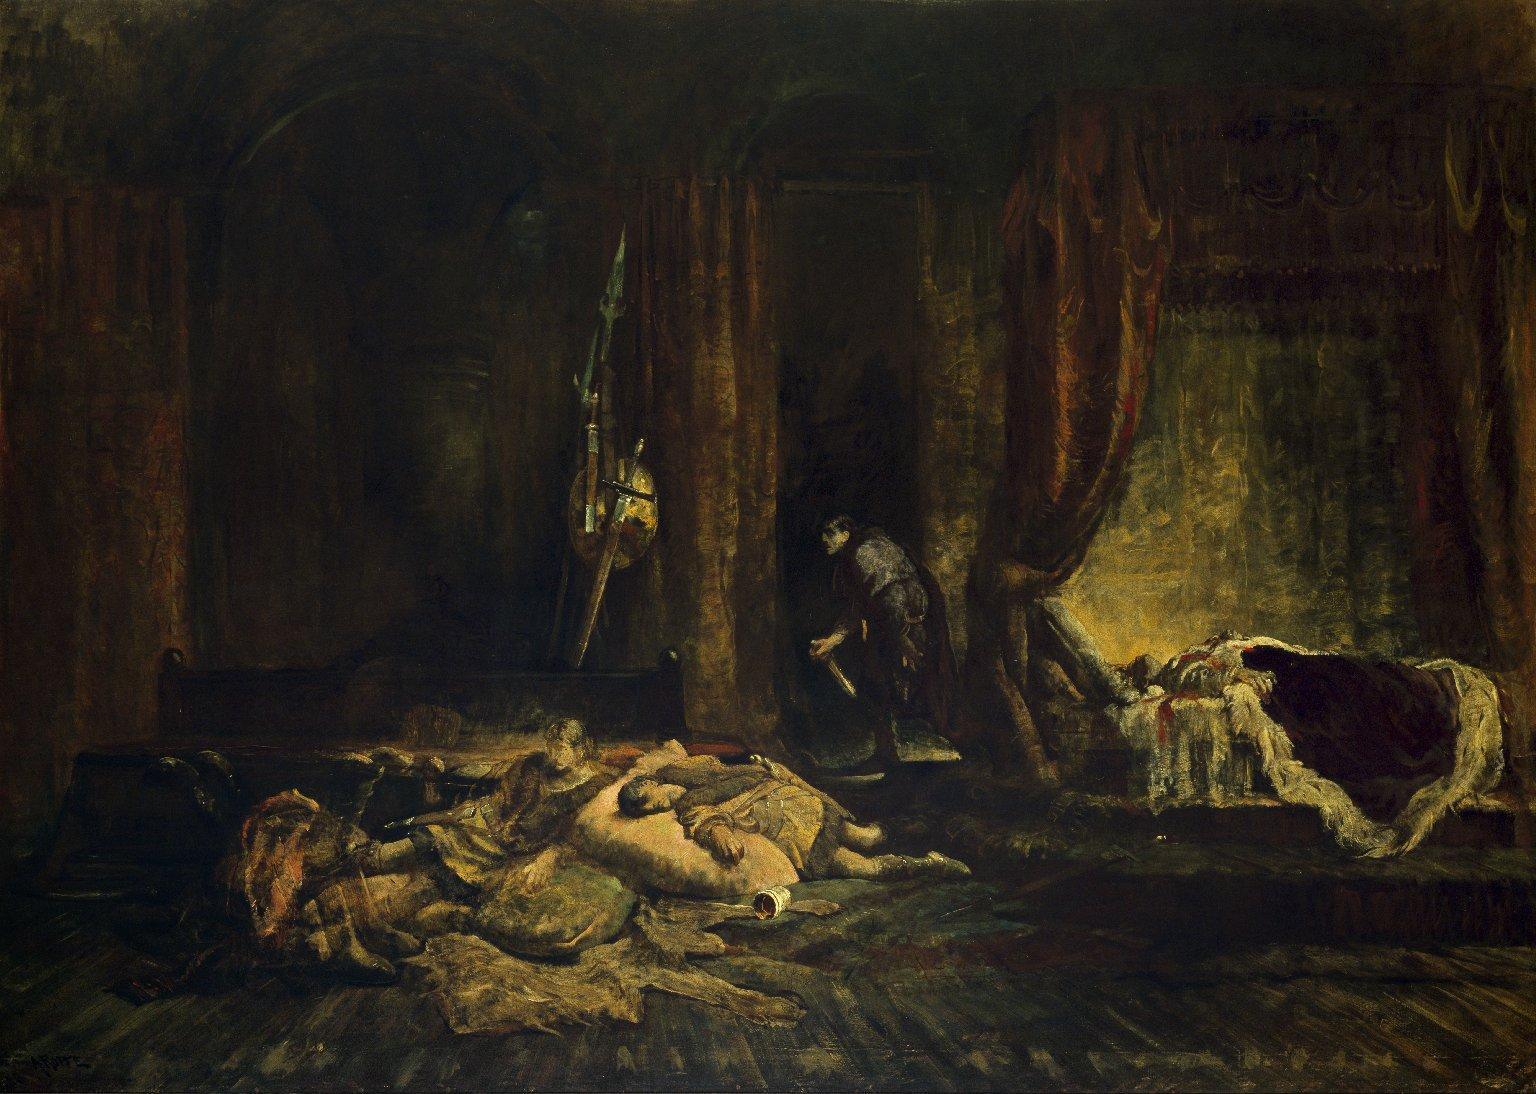 Macbeth's murder of Duncan